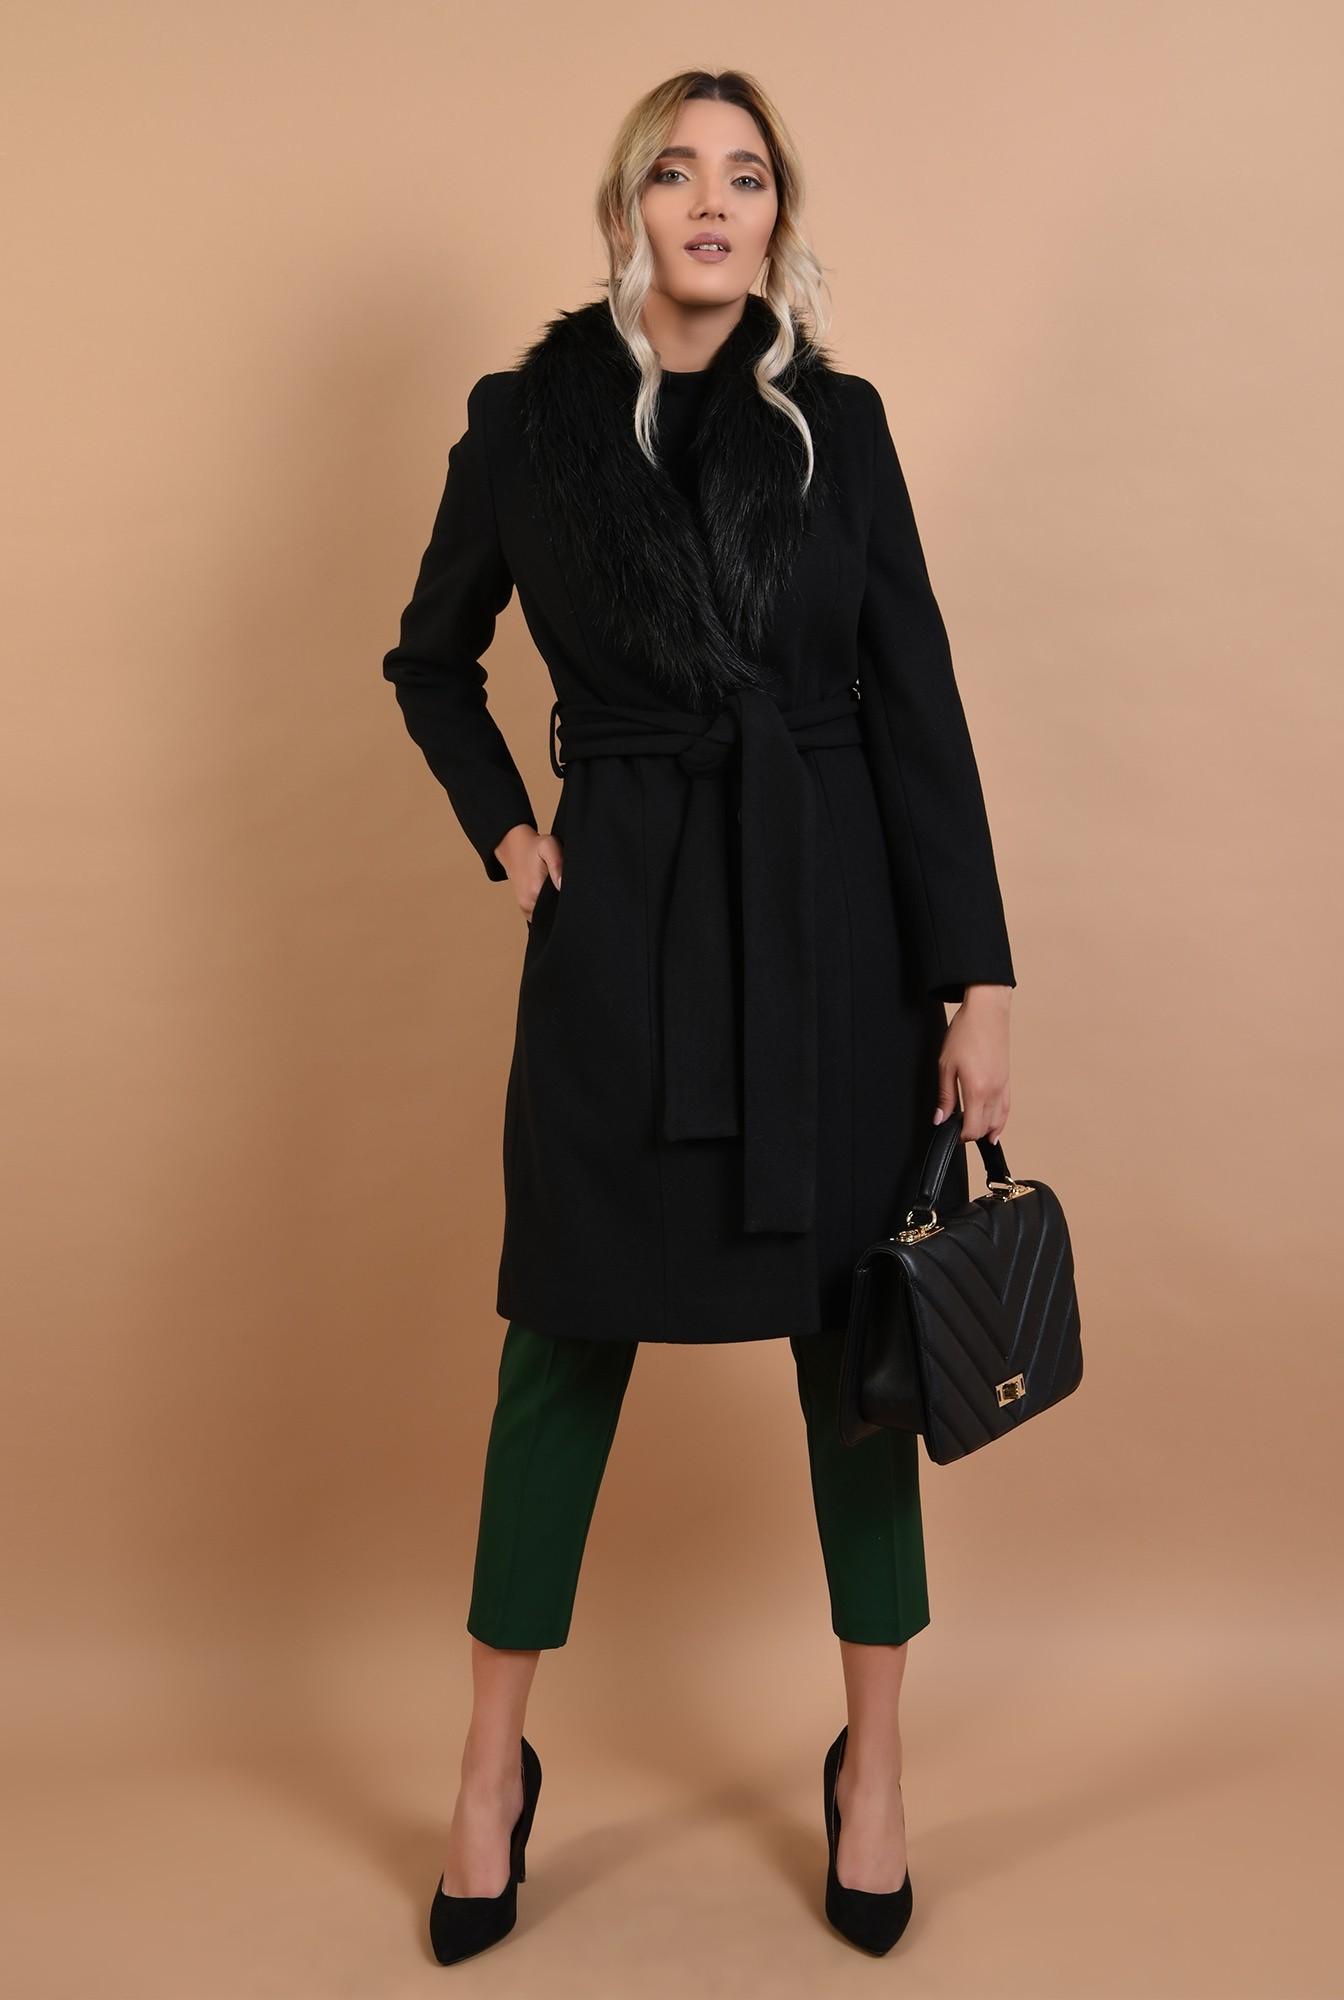 3 - palton cu blana, midi, negru, cu cordon, Poema